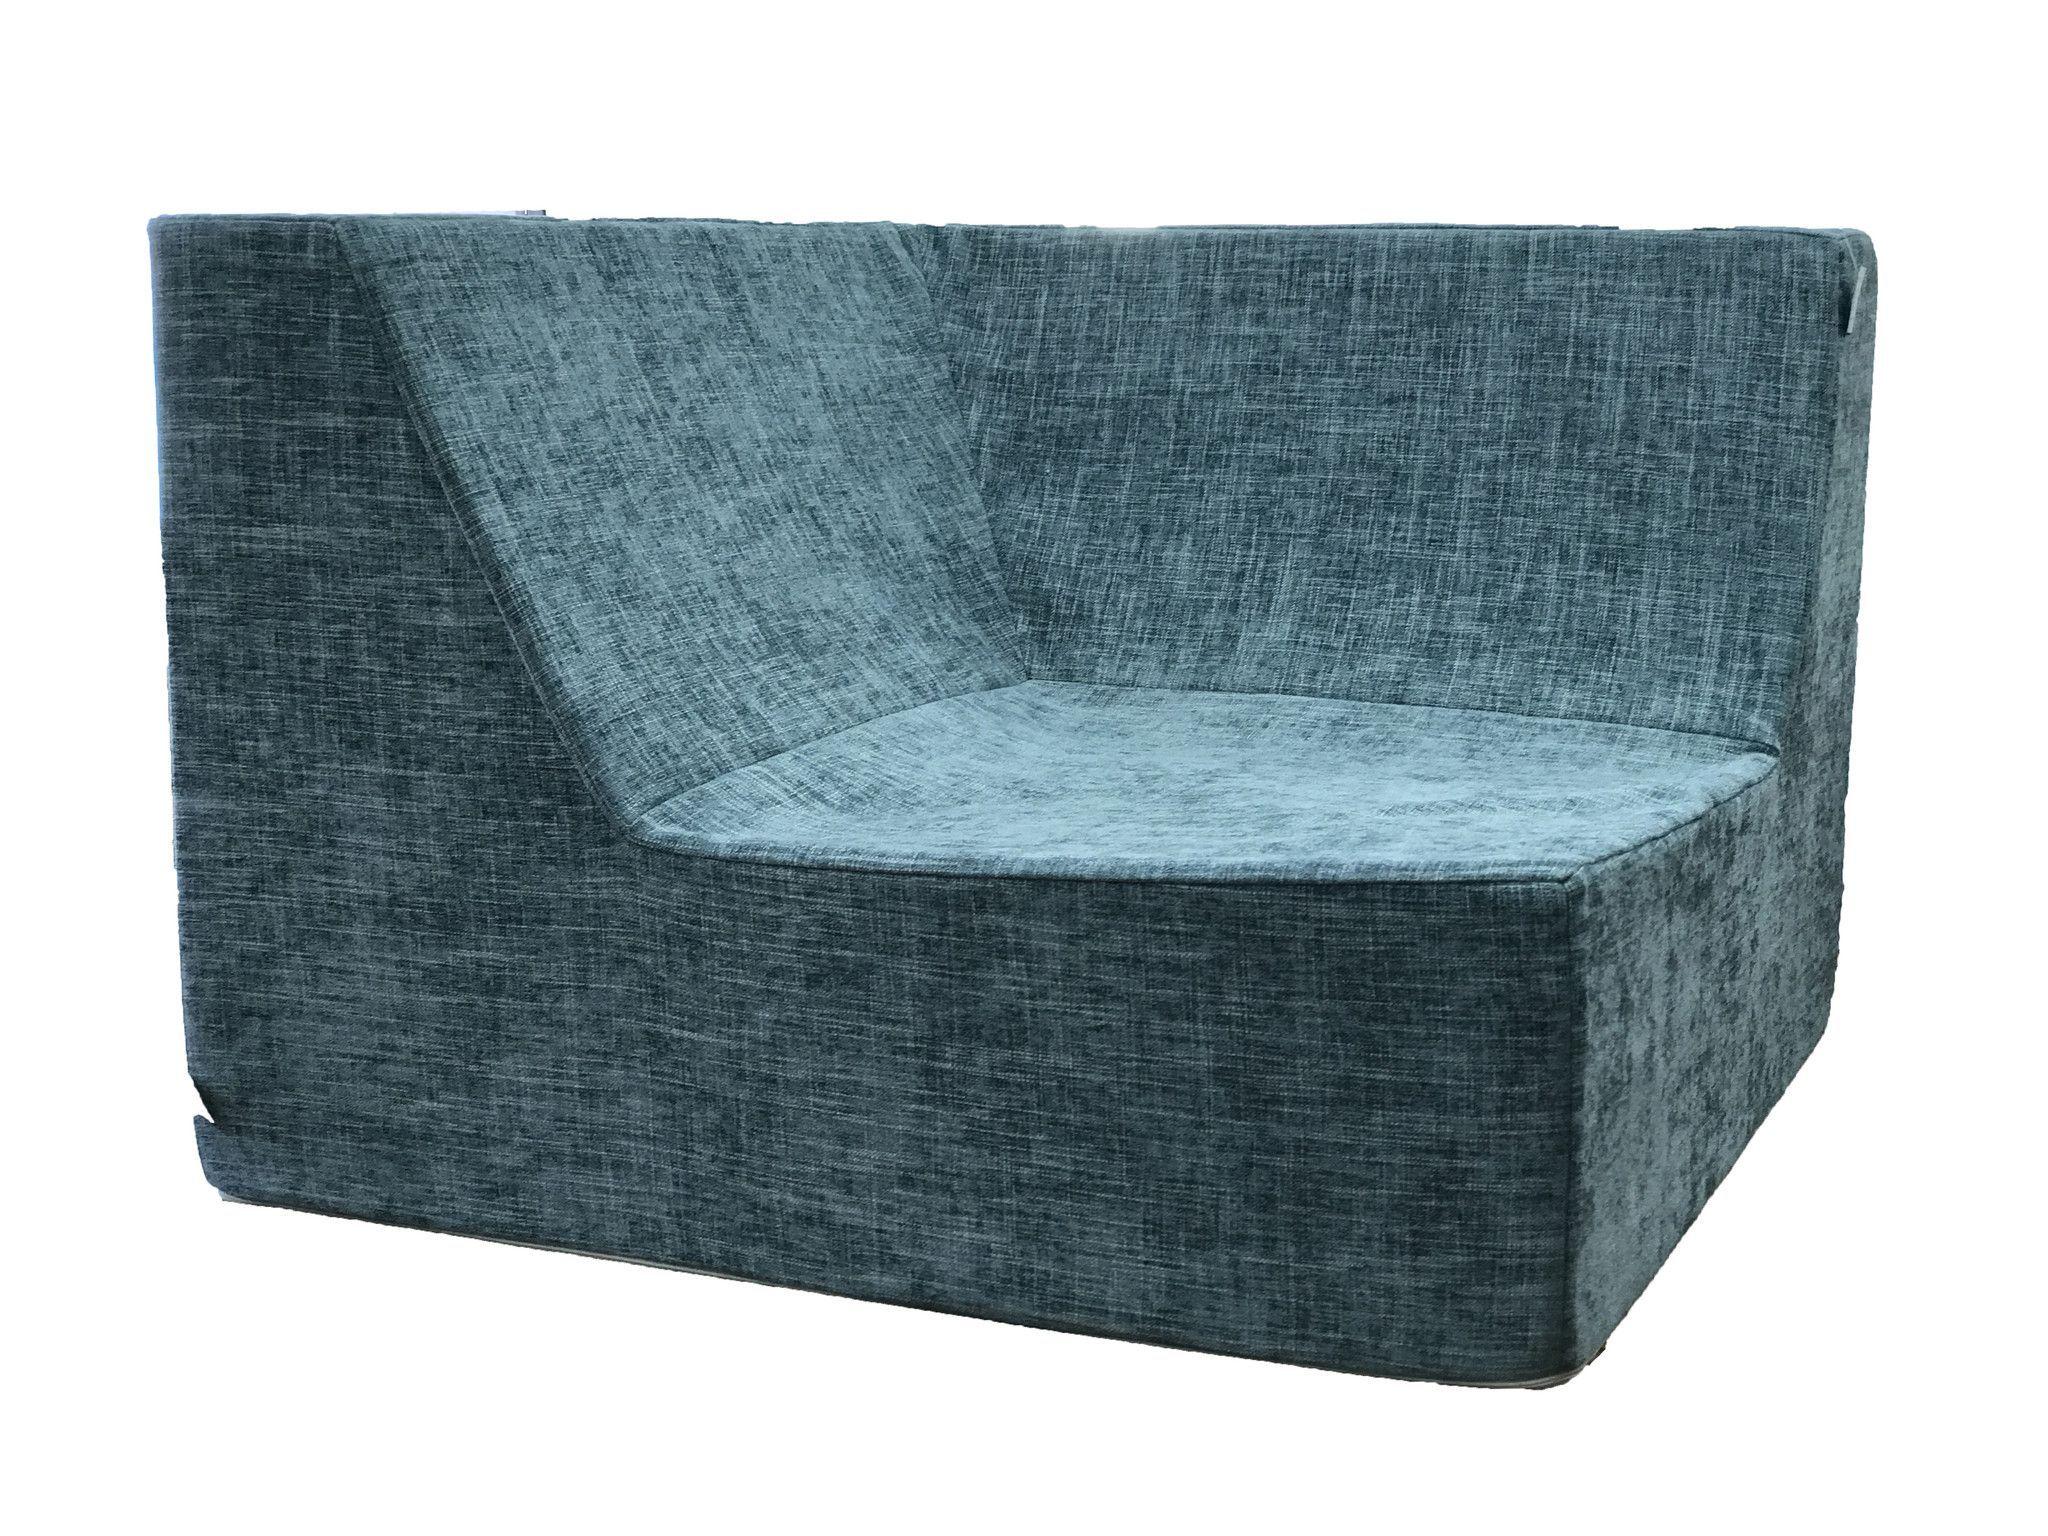 Lowboy Corner Lounge Chair